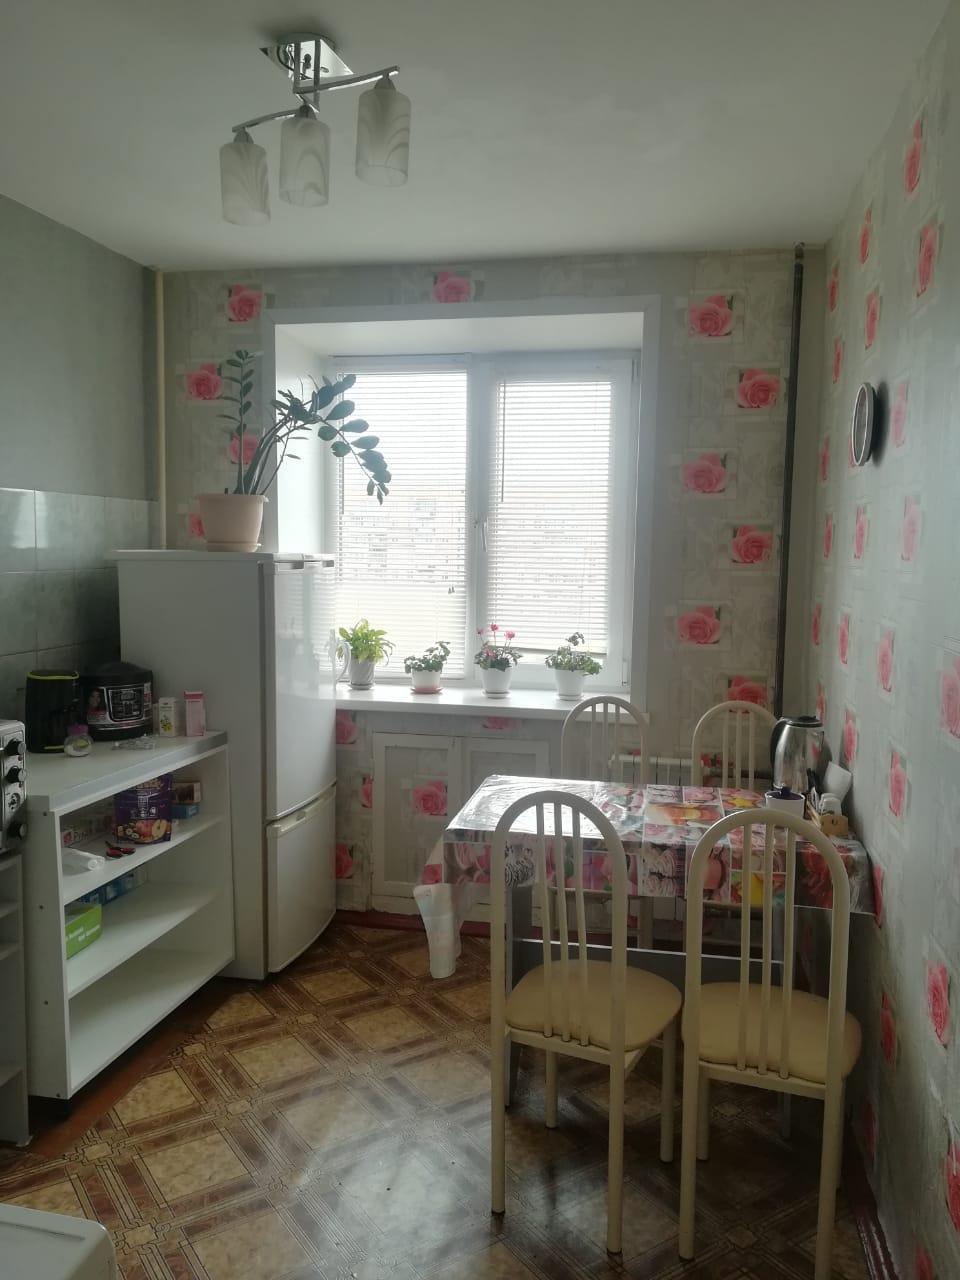 2к квартира Свердловская улица, 13 | 16000 | аренда в Красноярске фото 0